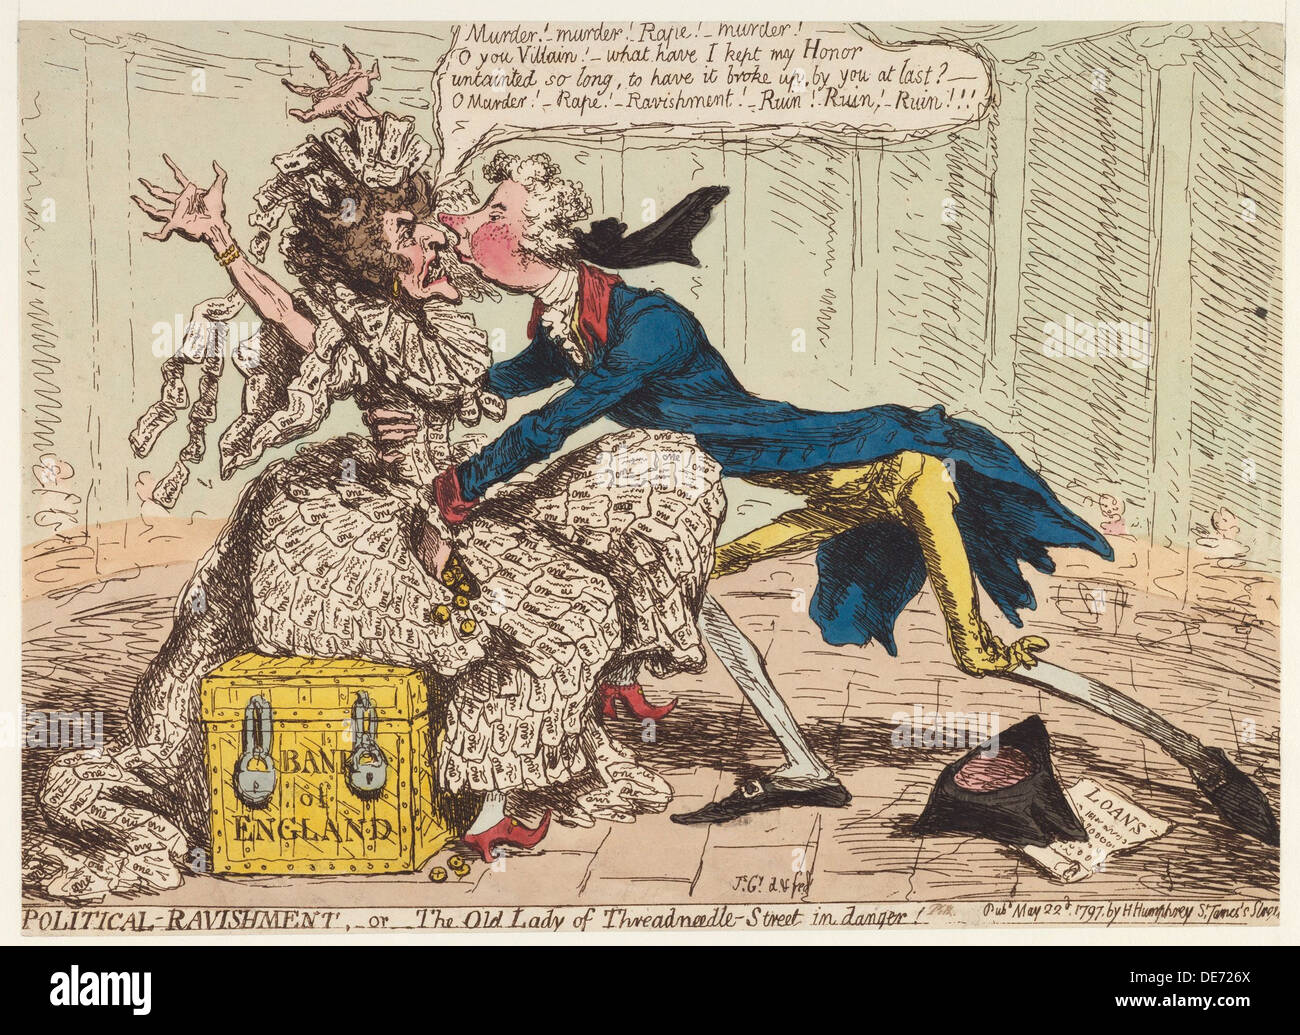 Political Ravishment, or the Old Lady of Threadneedle Street in Danger!, 1797. Artist: Gillray, James (1757-1815) - Stock Image